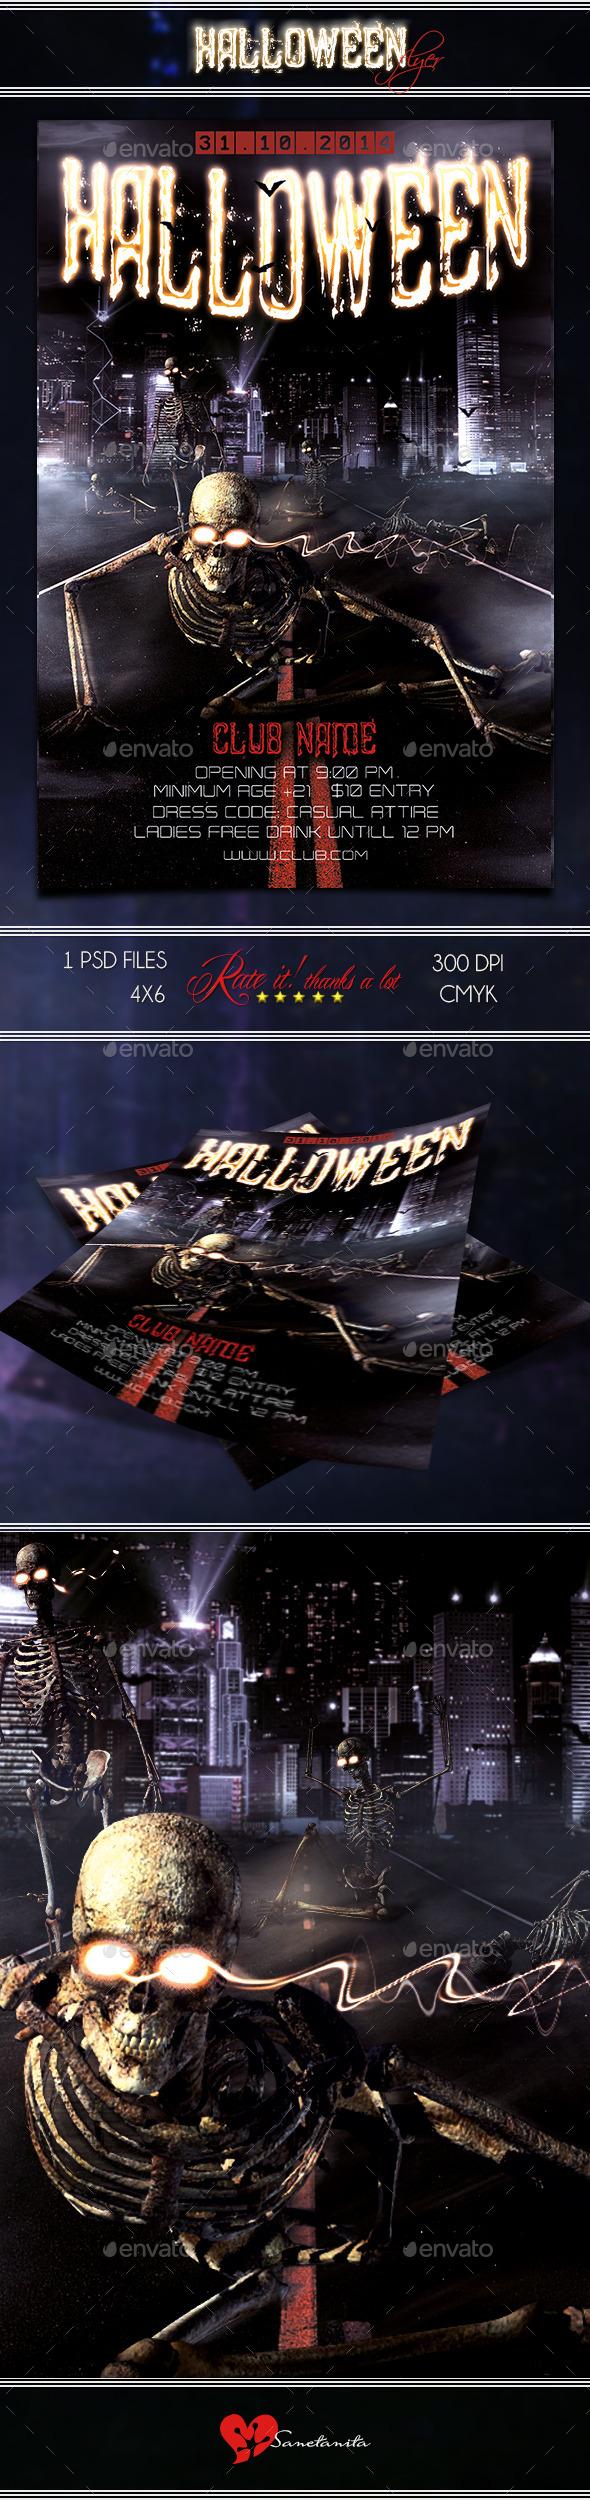 GraphicRiver Halloween Flyer 8824410